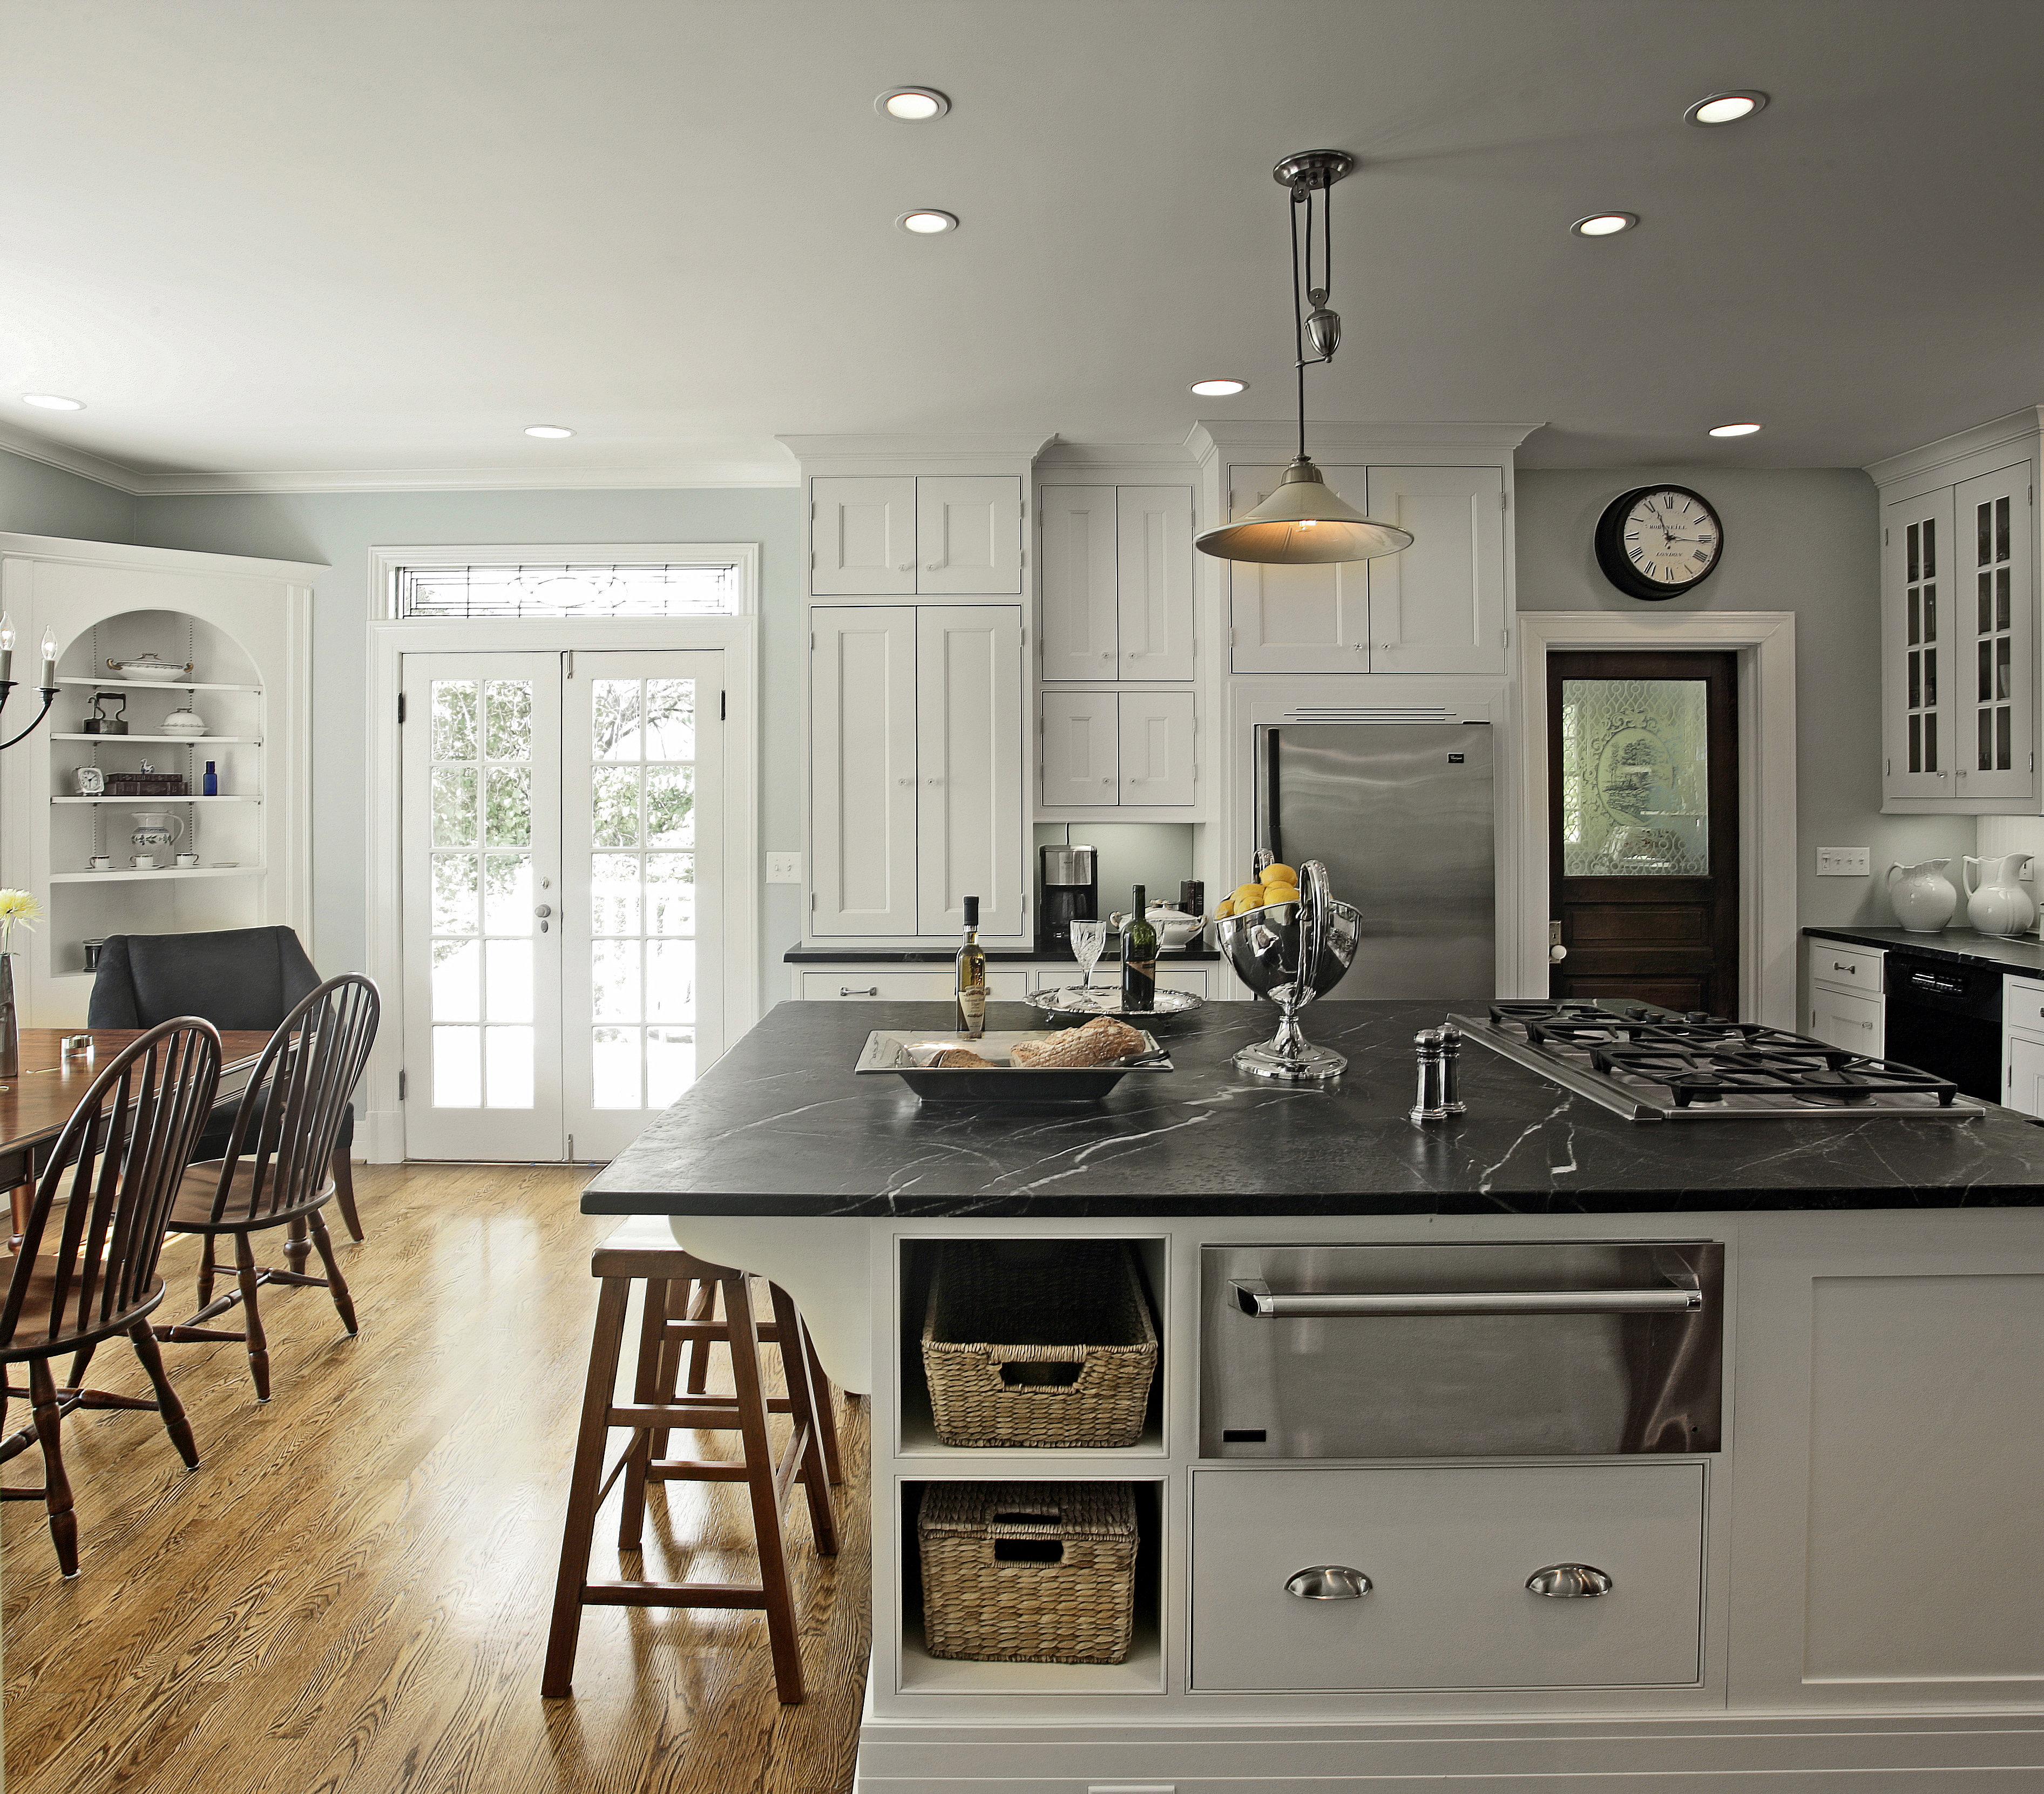 Kitchen renovation bynum design blog - Kitchen design blog ...